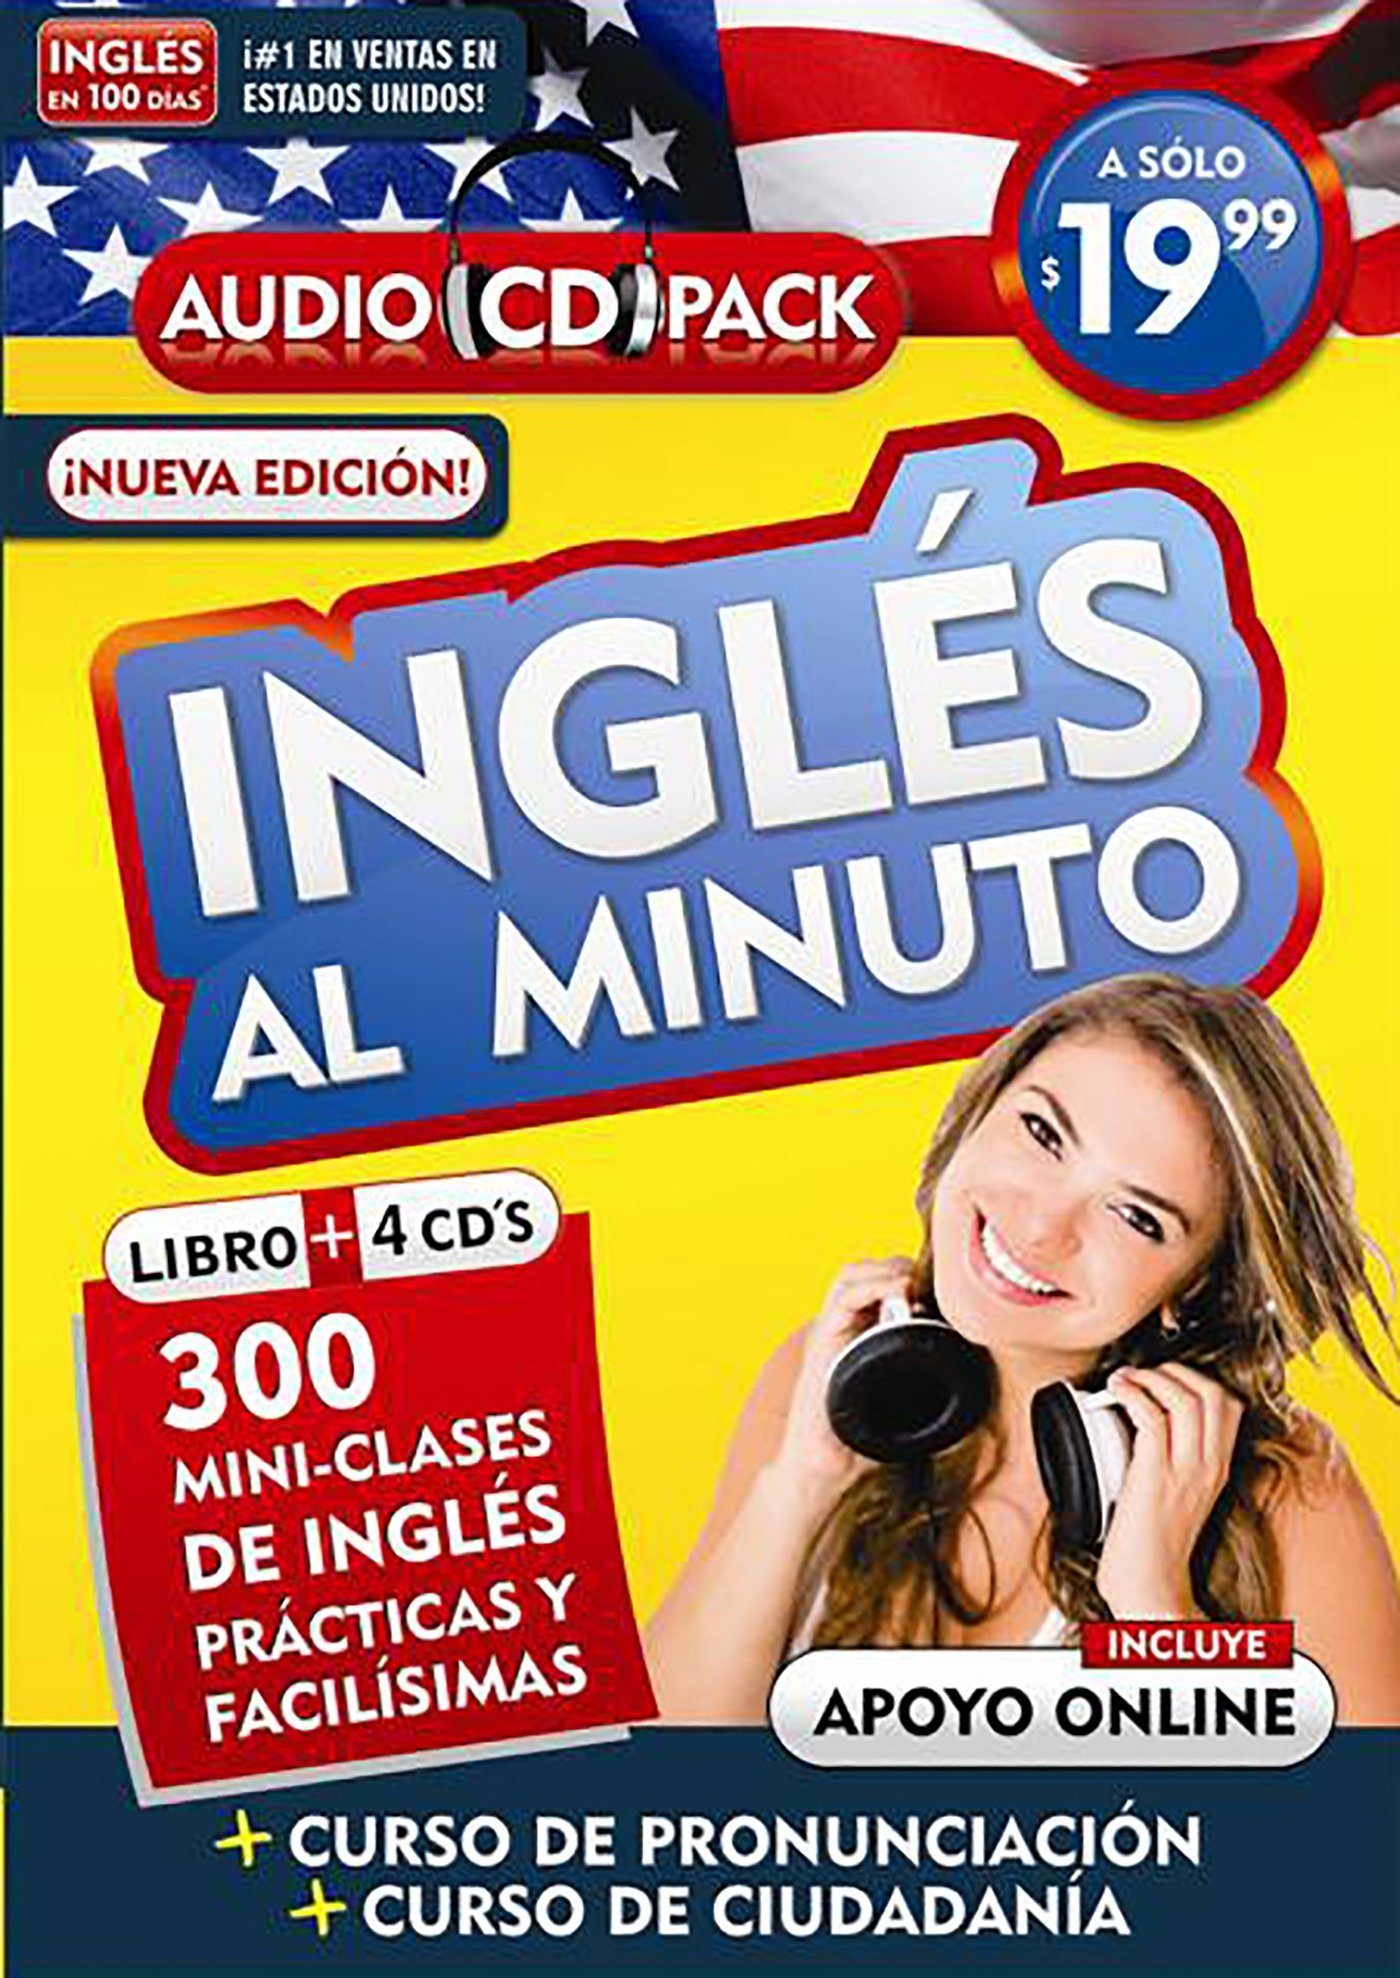 Inglés en 100 días - Inglés al minuto - Audio Pack (Libro + 4 CD's Audio)